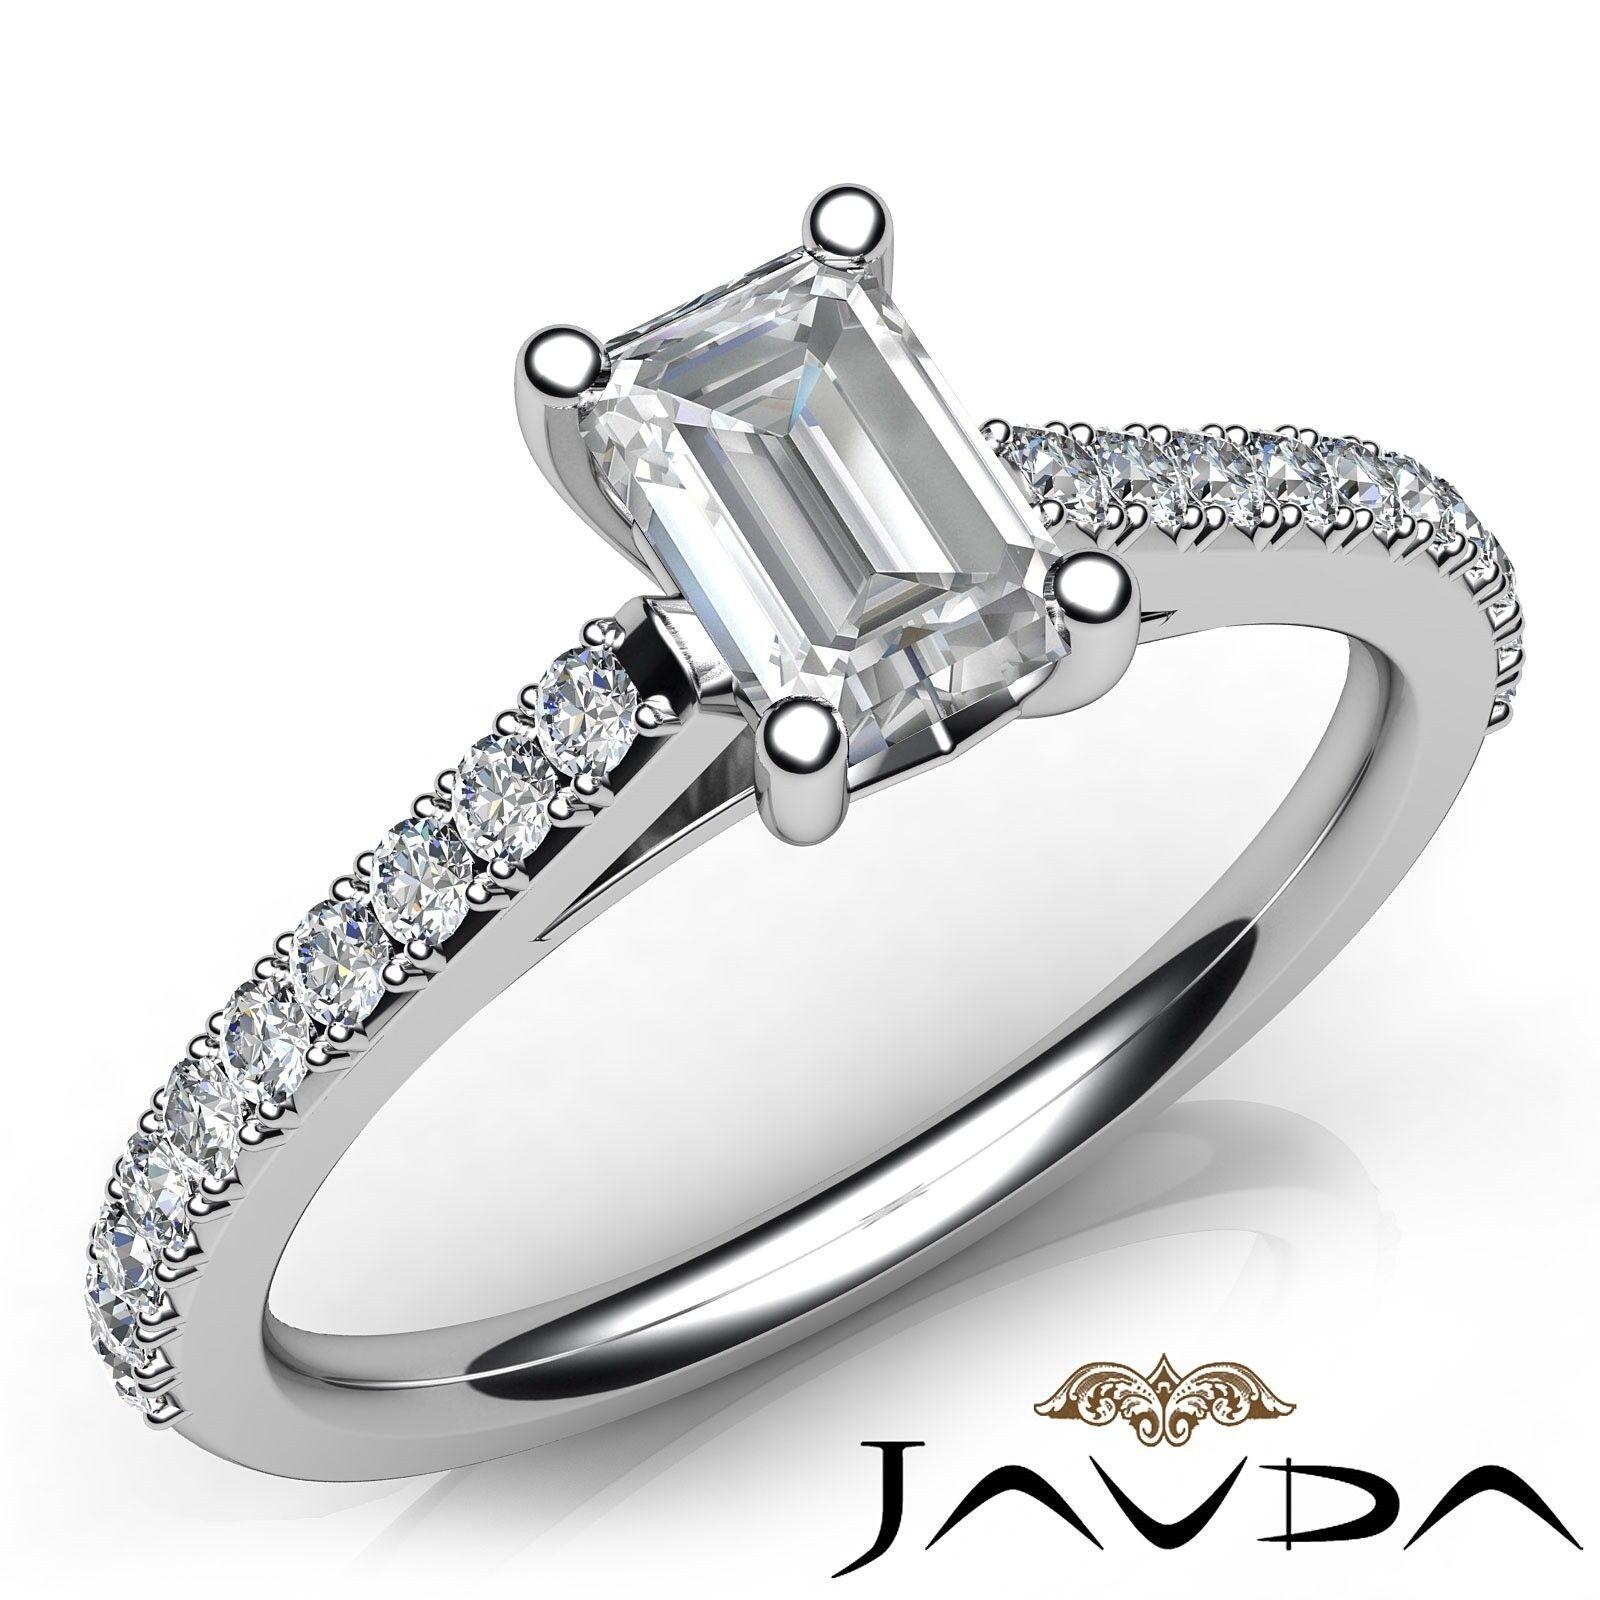 0.8ctw Classic Prong Set Emerald Diamond Engagement Javda Ring GIA F-VVS1 W Gold